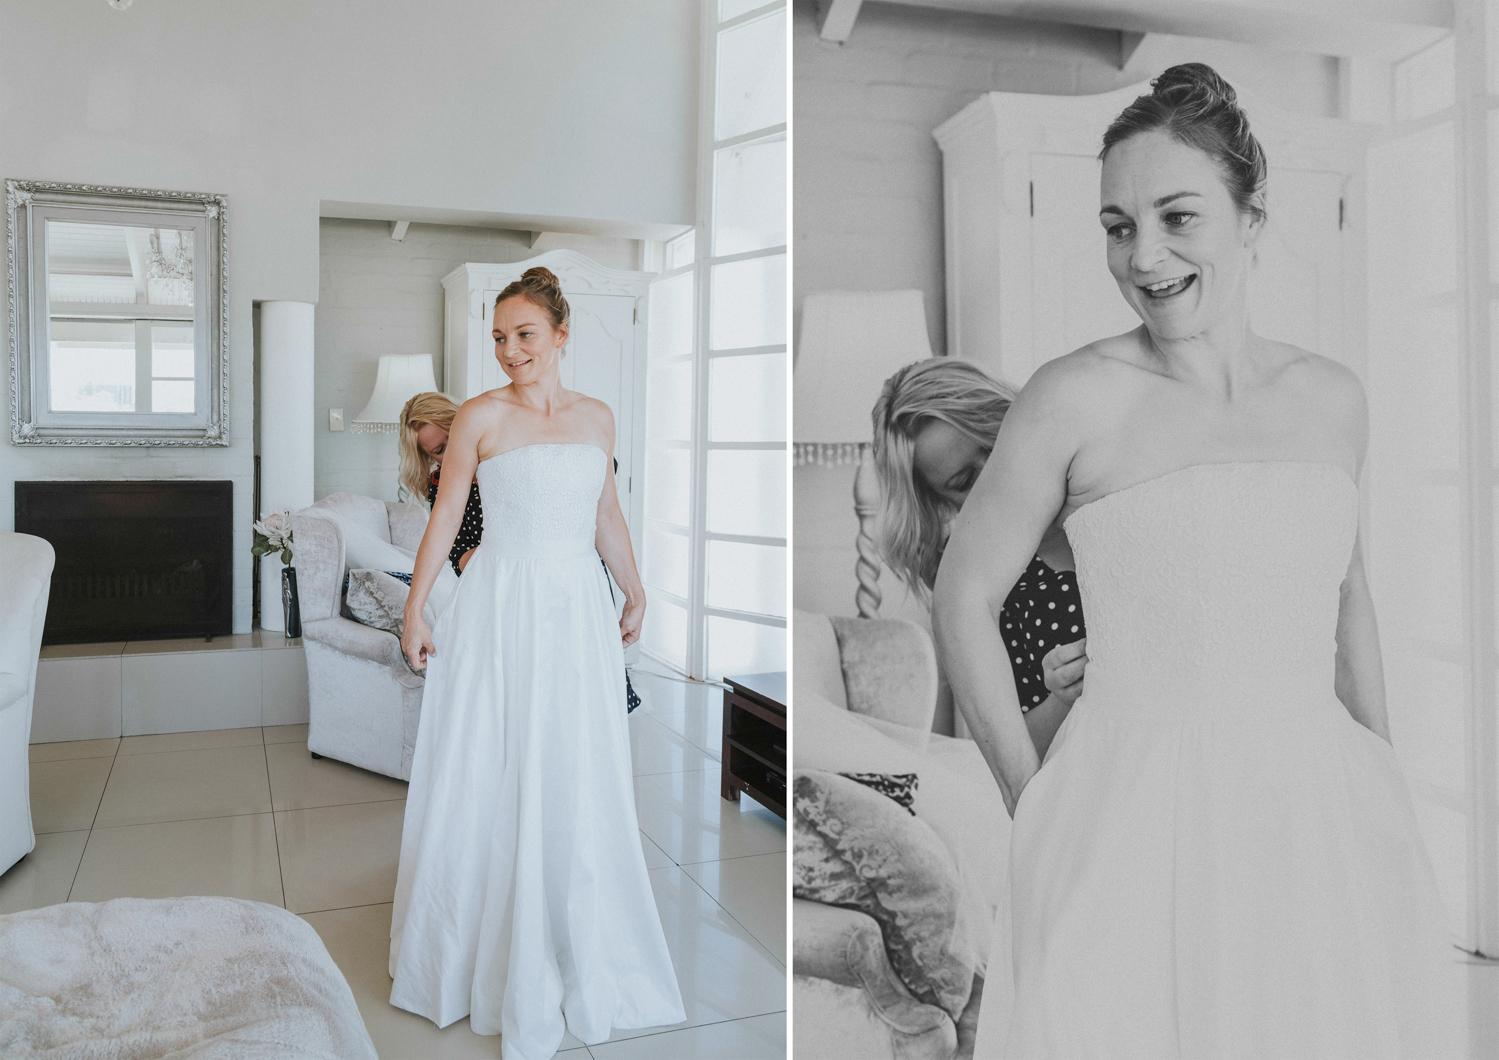 Cape Town Wedding Photographer - Bianca Asher-19.jpg